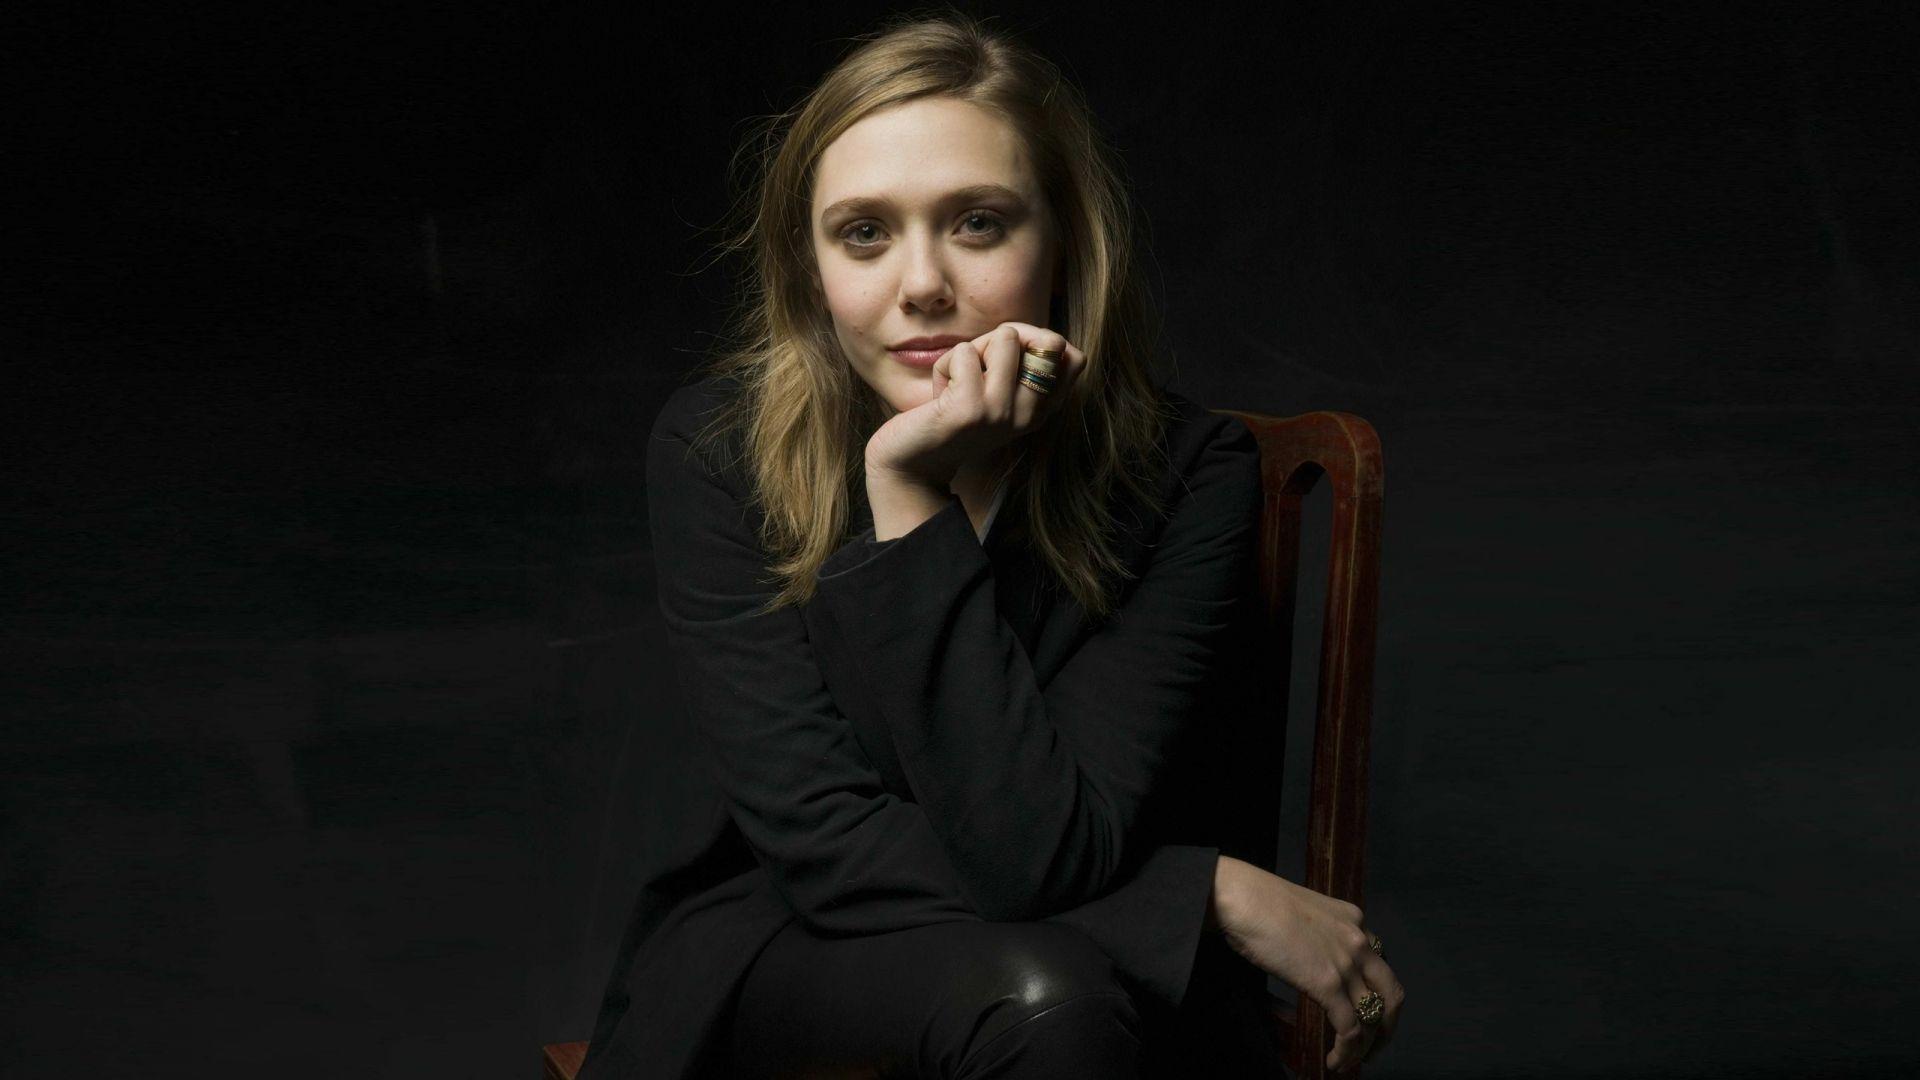 Elizabeth Olsen Wallpapers - Wallpaper Cave